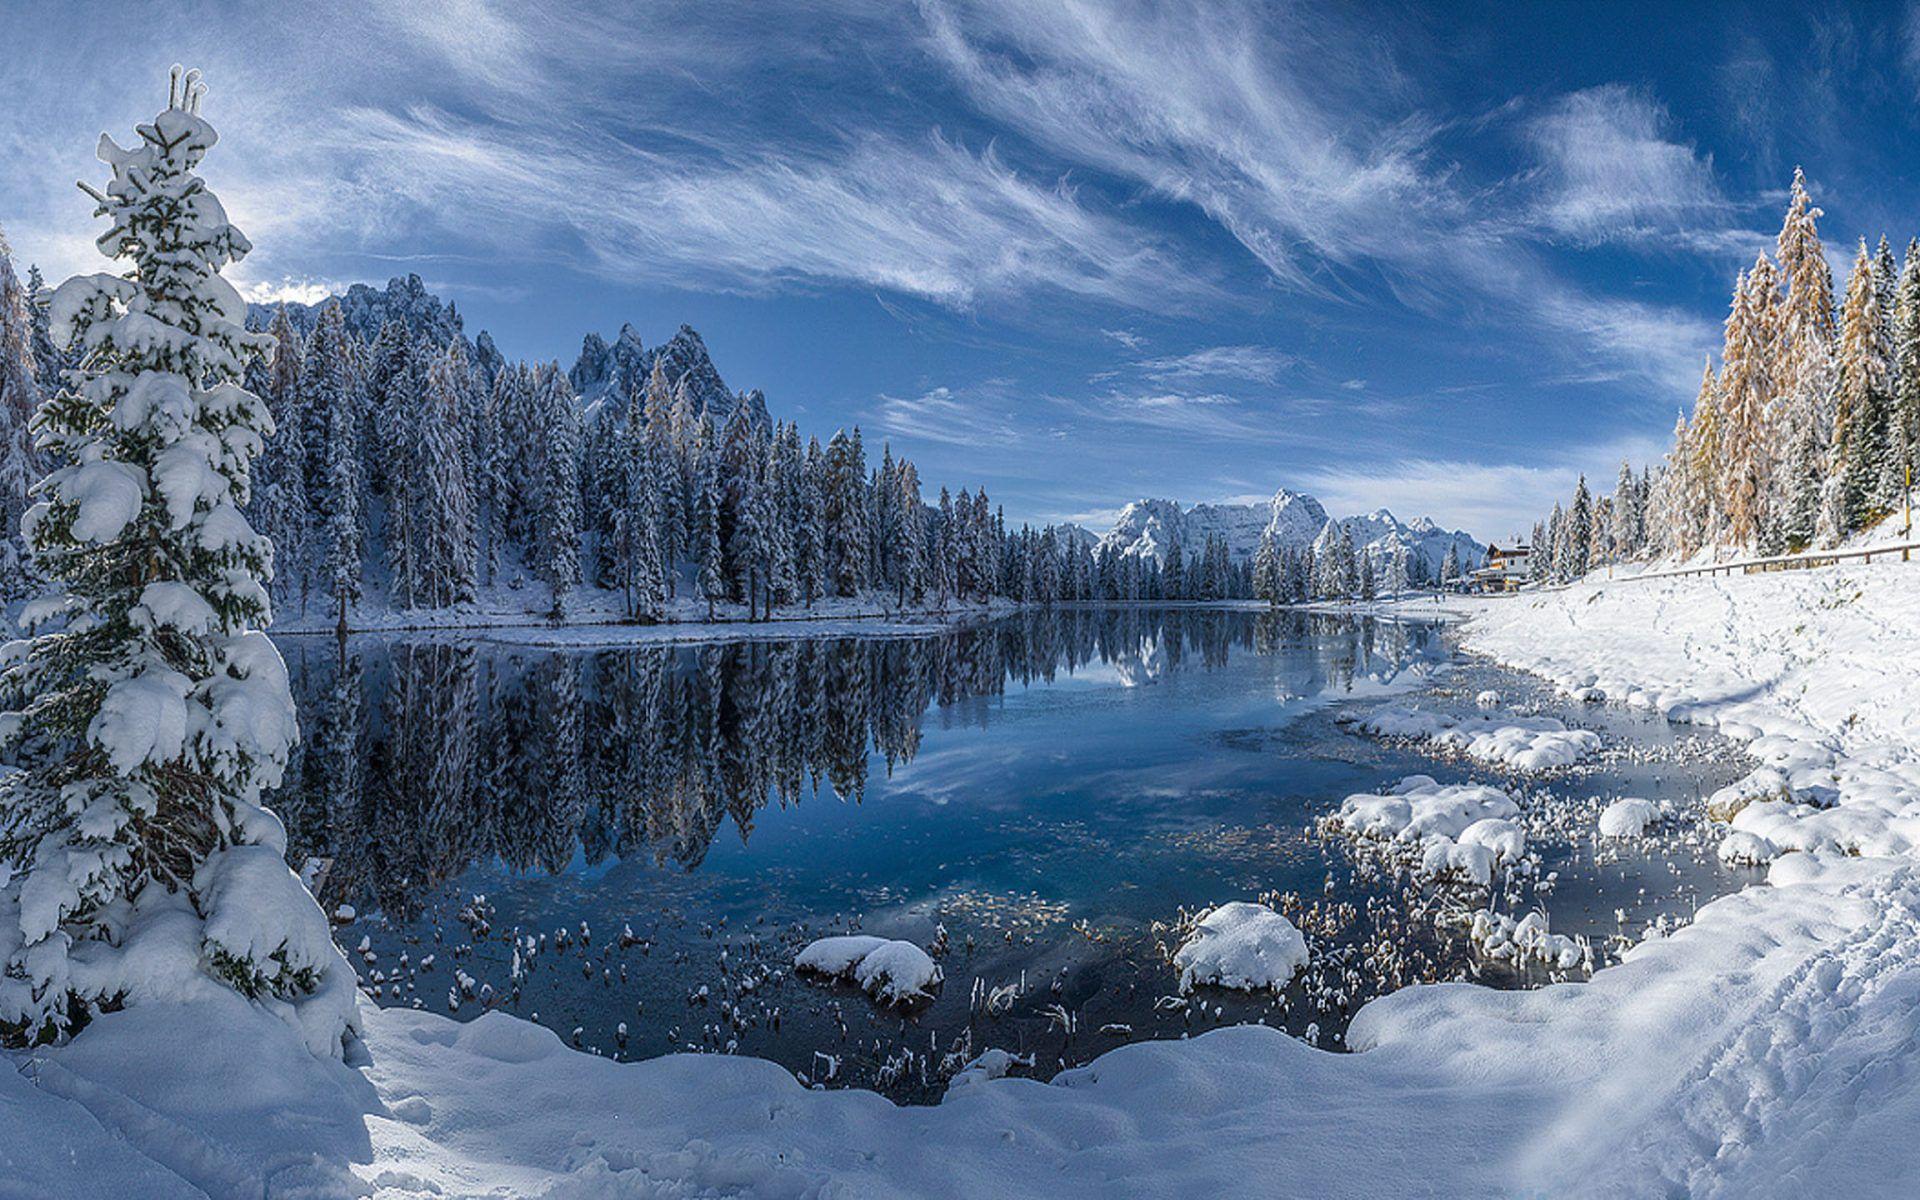 Descargar 2560x1440 Cielo Claro Sobre Las Montañas Nevadas: Paisaje Nevado